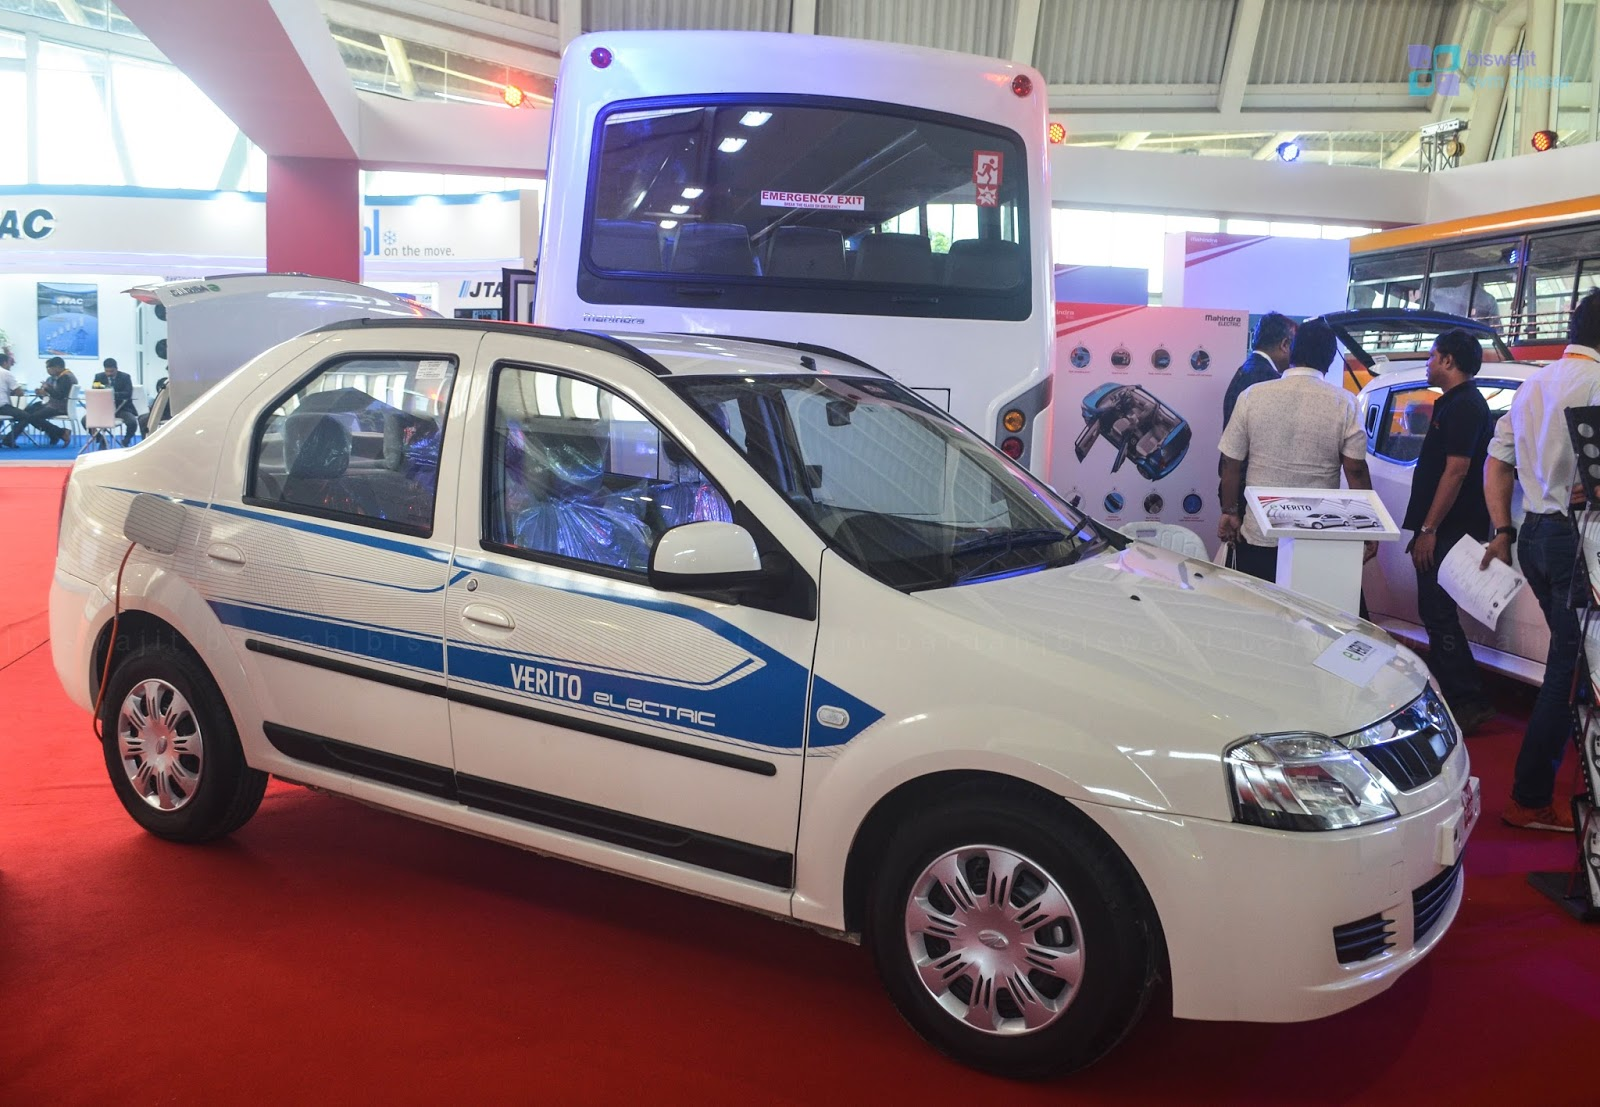 project on mahindra mahindra ltd swaraj division Anil bhardwaj deputy manager in manufacturing engg at mahindra & mahindra ltd, fes, swaraj division location chandigarh area, india industry automotive.